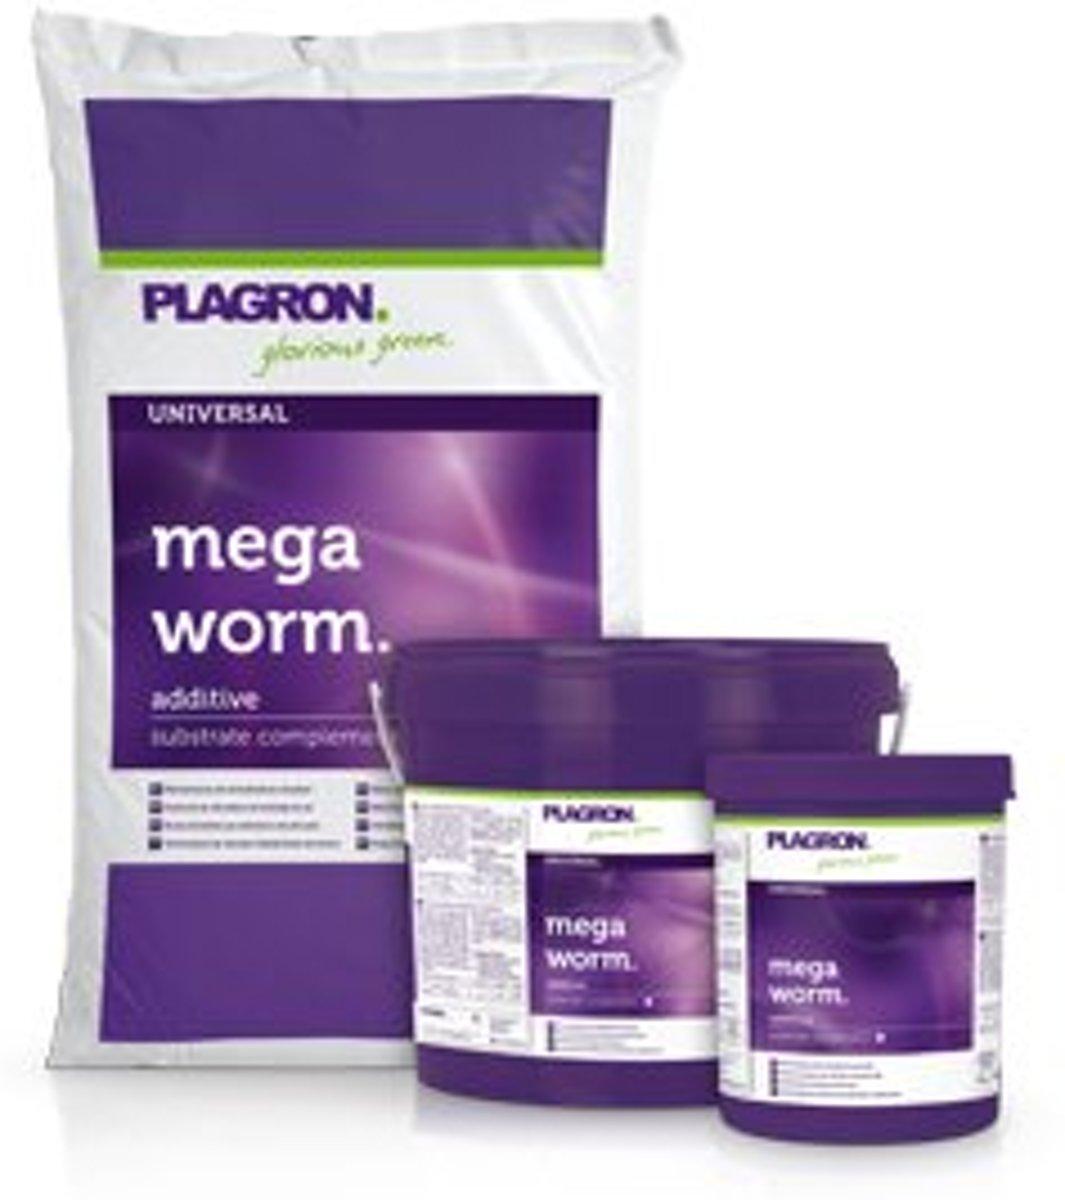 Plagron Mega Worm 1 ltr kopen